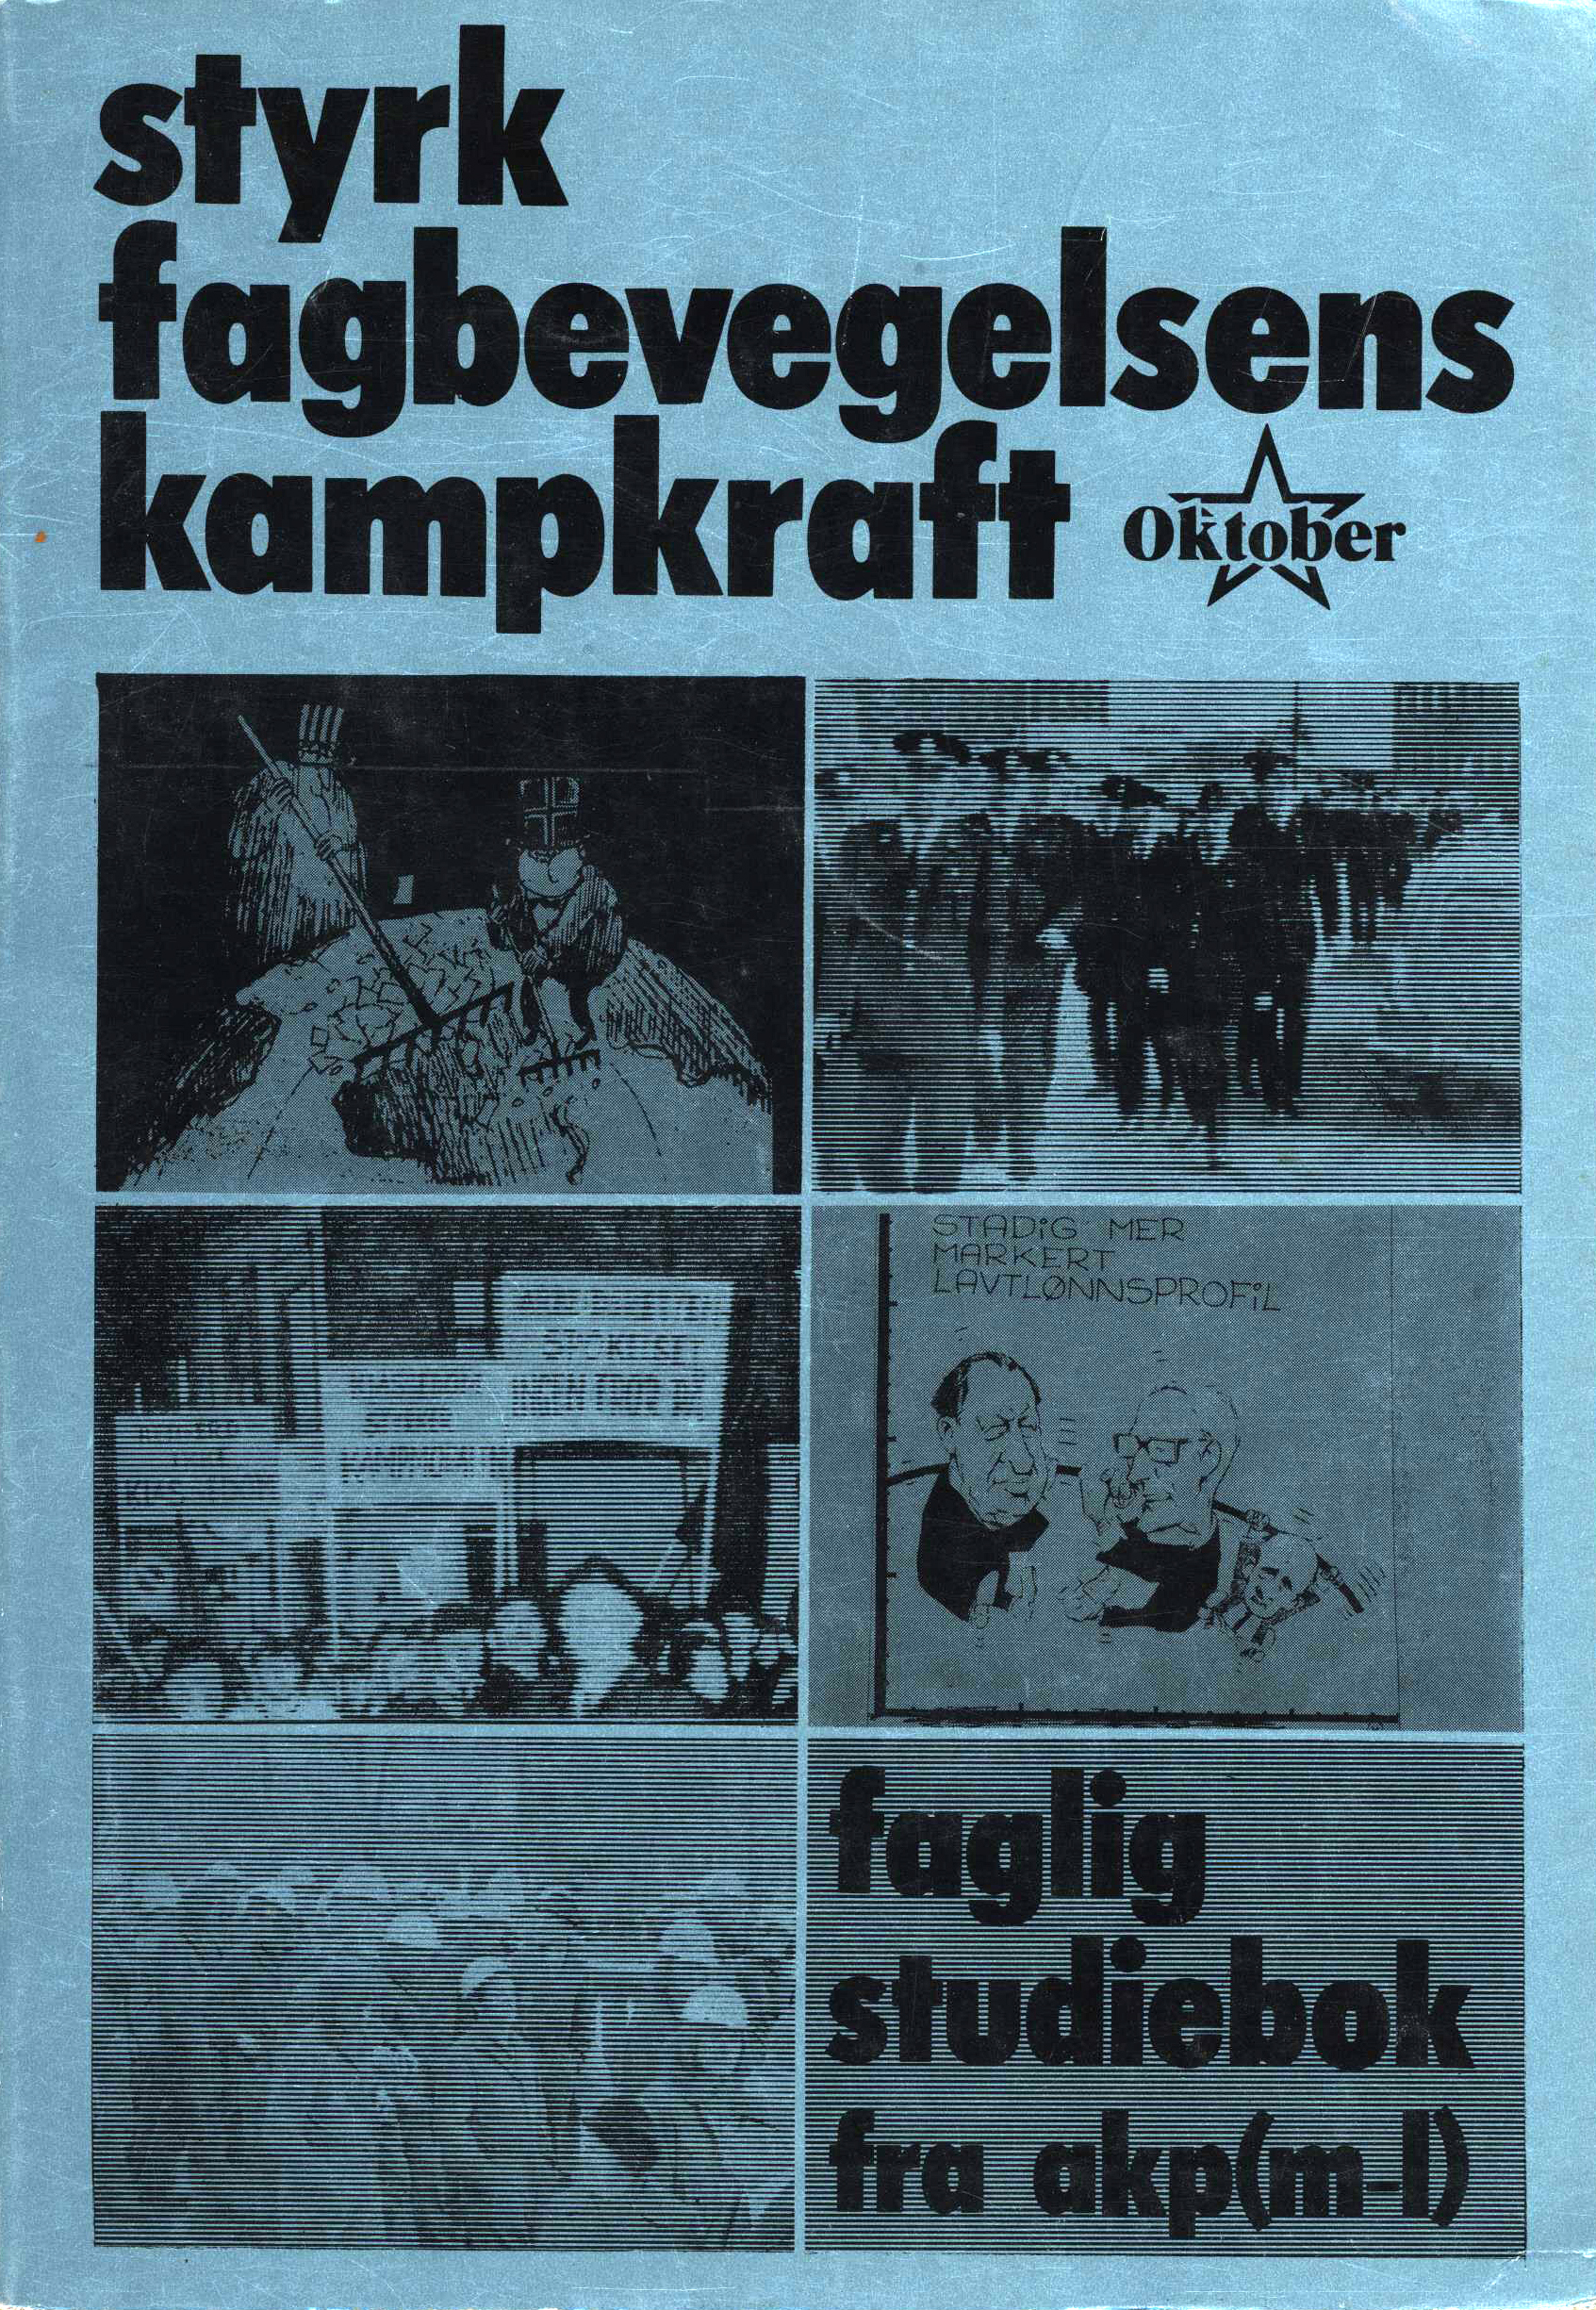 Styrk fagbevegelsens kampkraft - Faglig studiebok fra AKP(m-l)